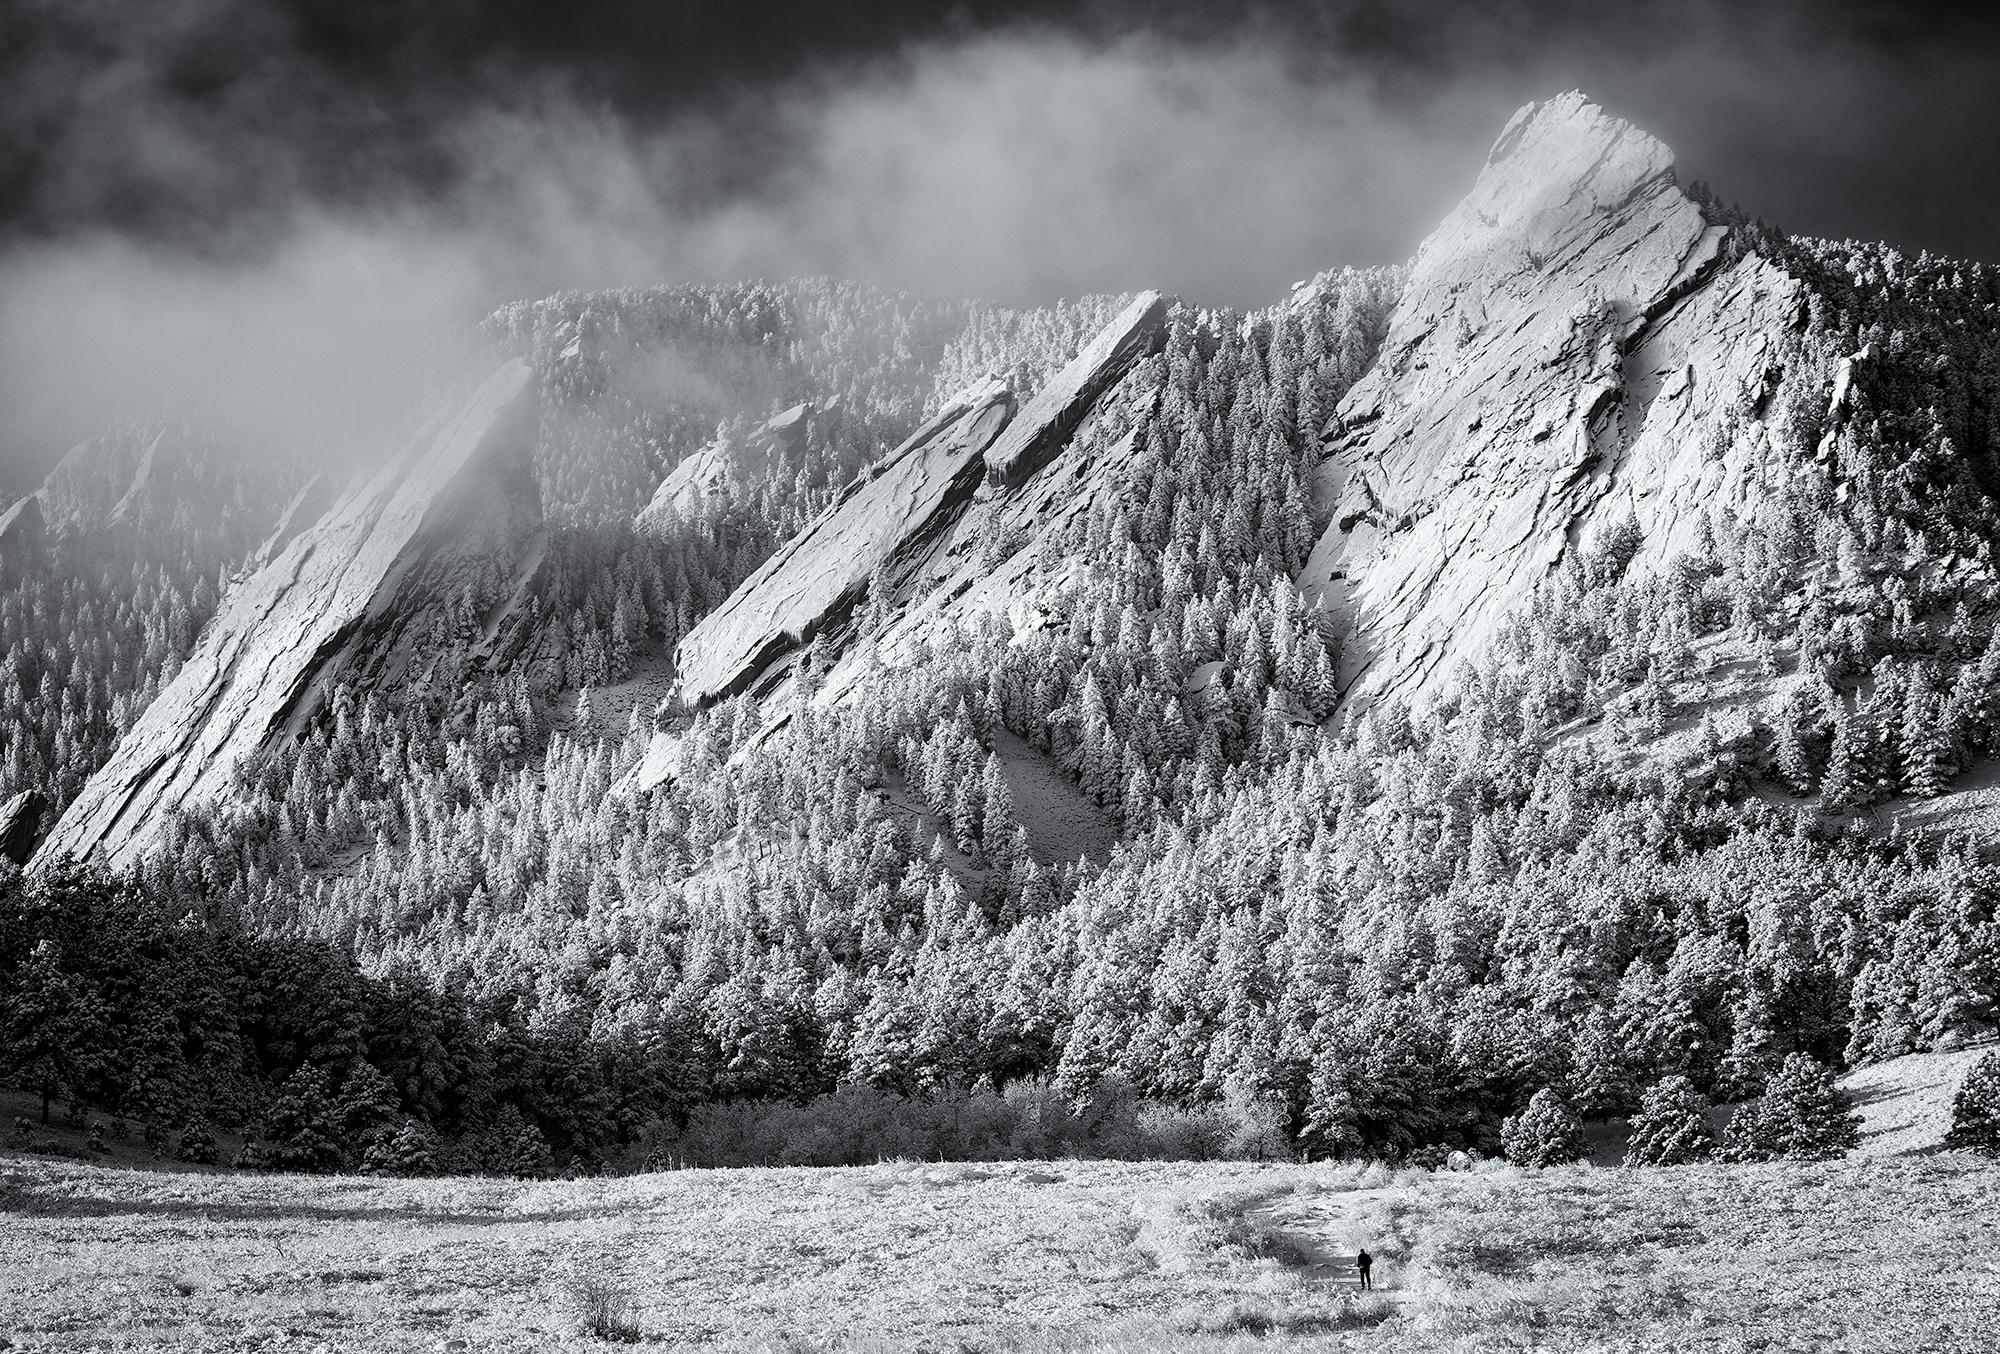 Winter Stroll, Flatirons. Boulder, Colorado, 2015